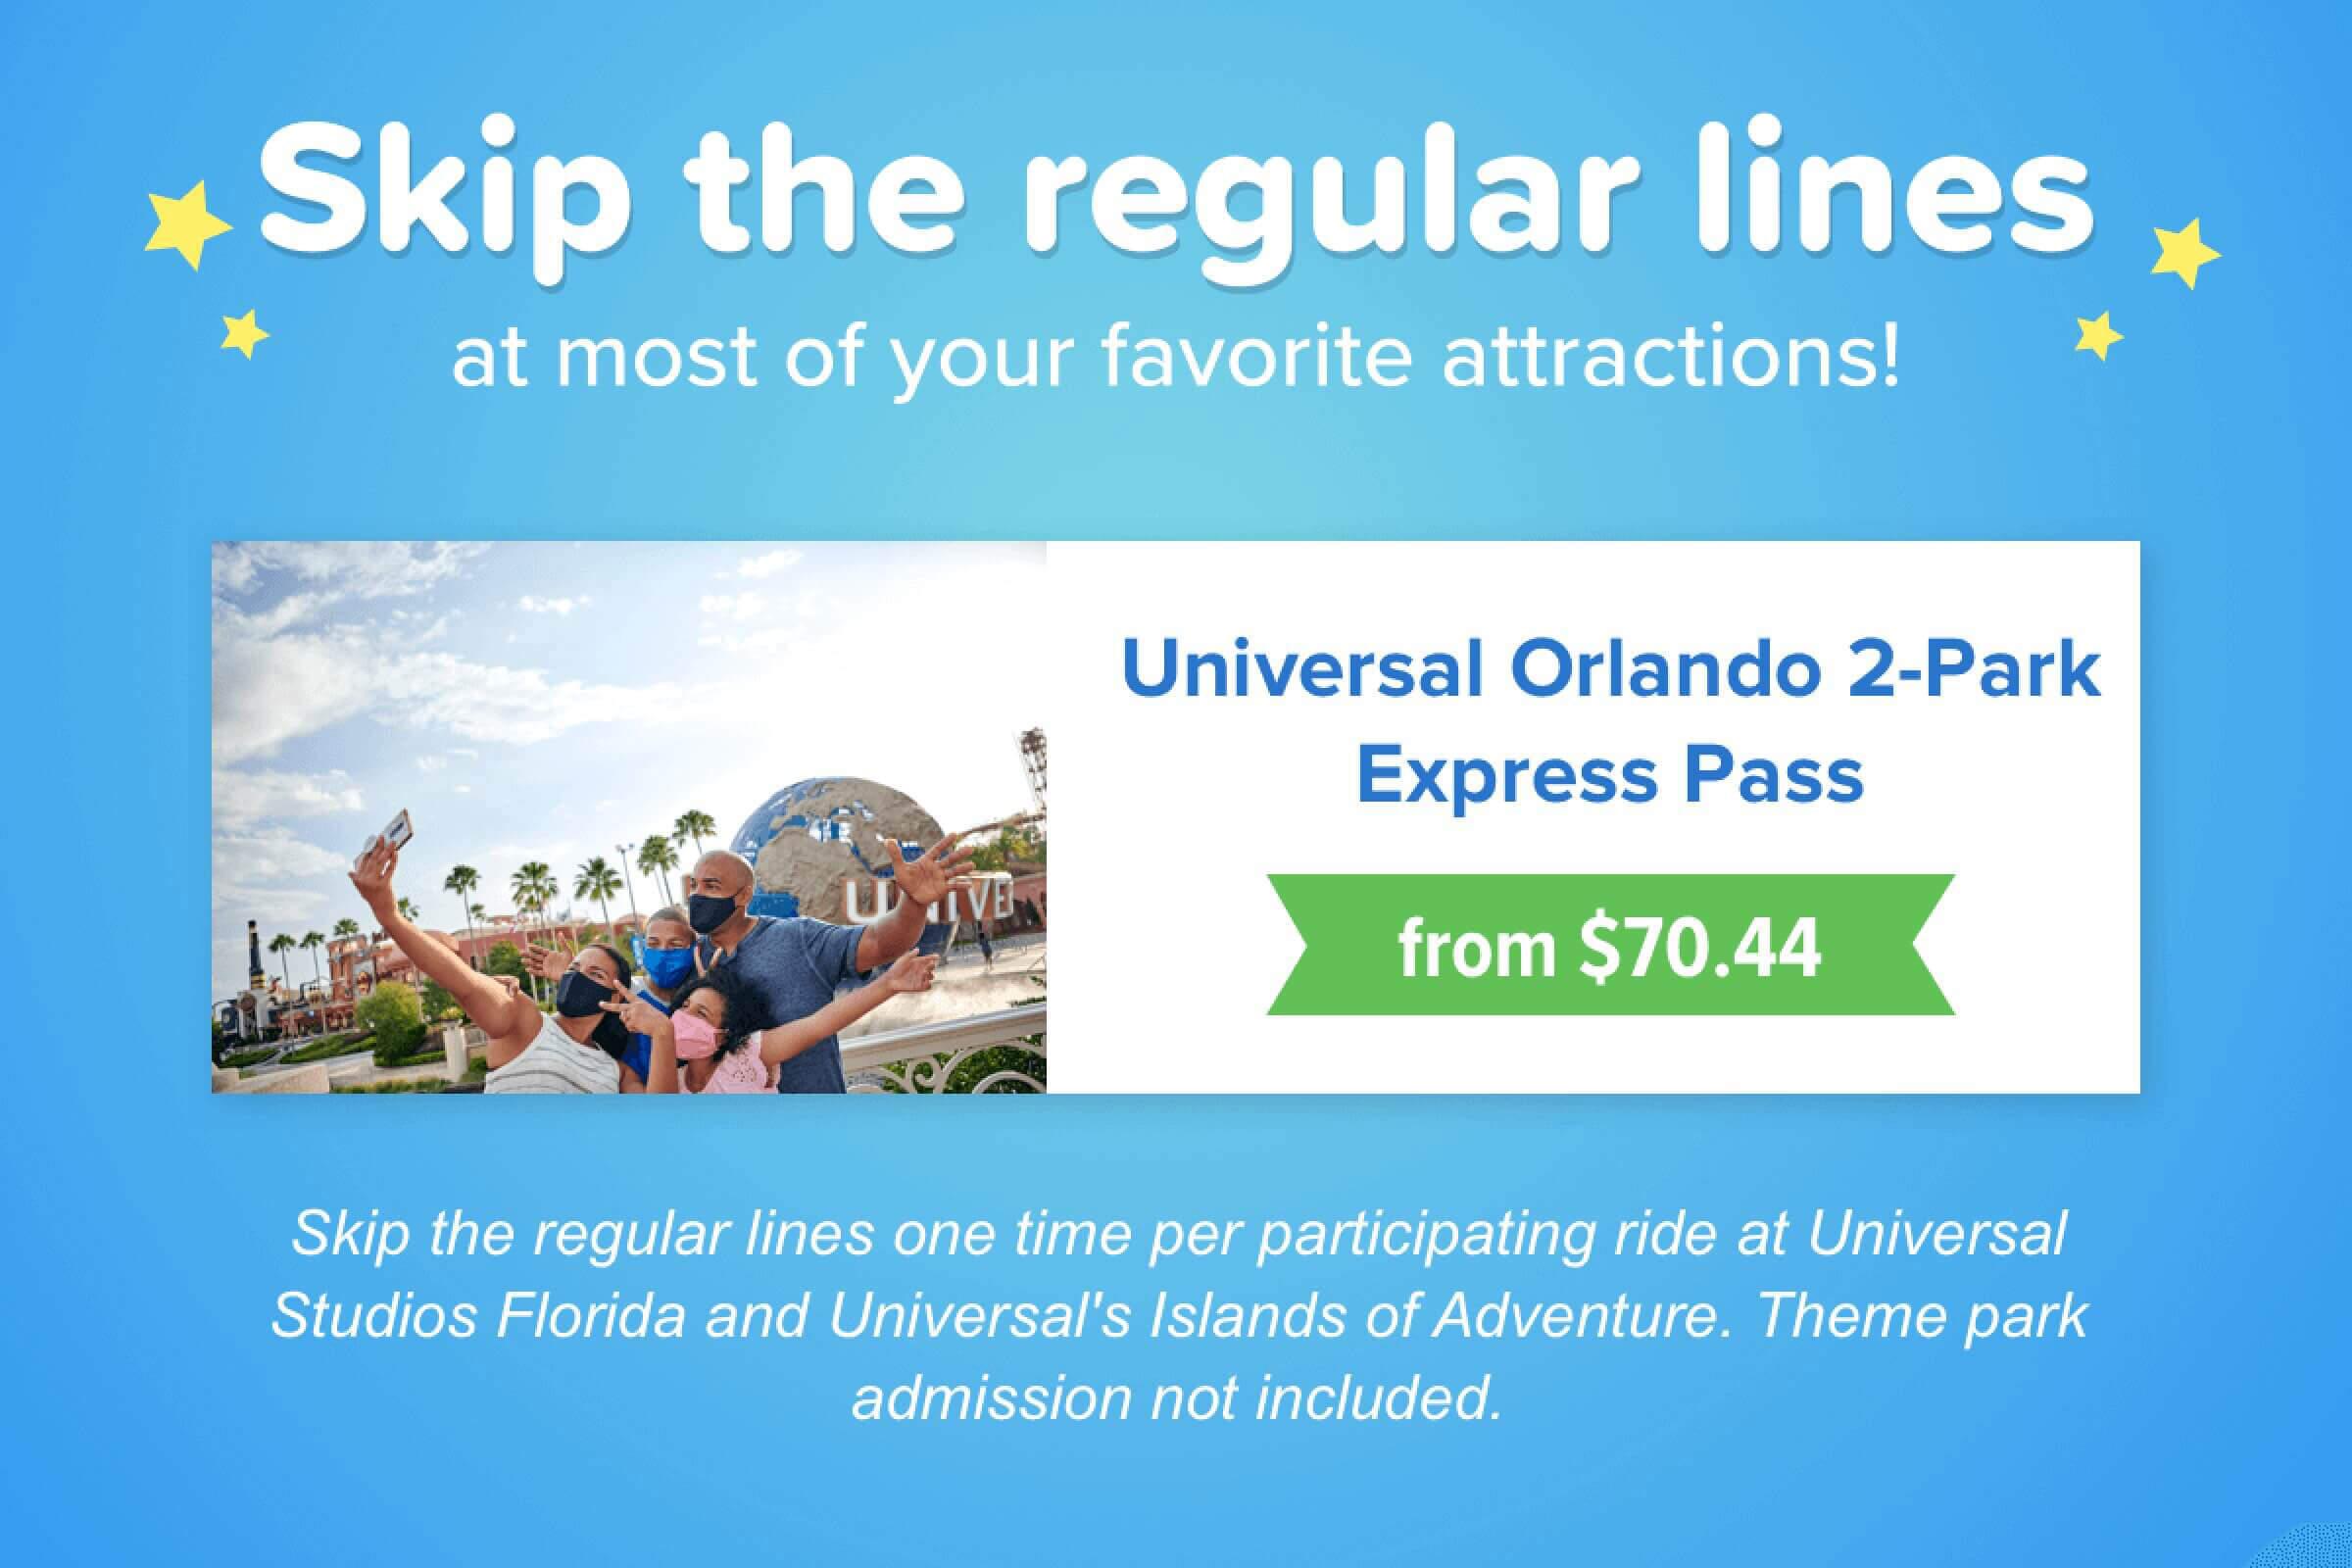 Skip the lines at Universal Orlando!